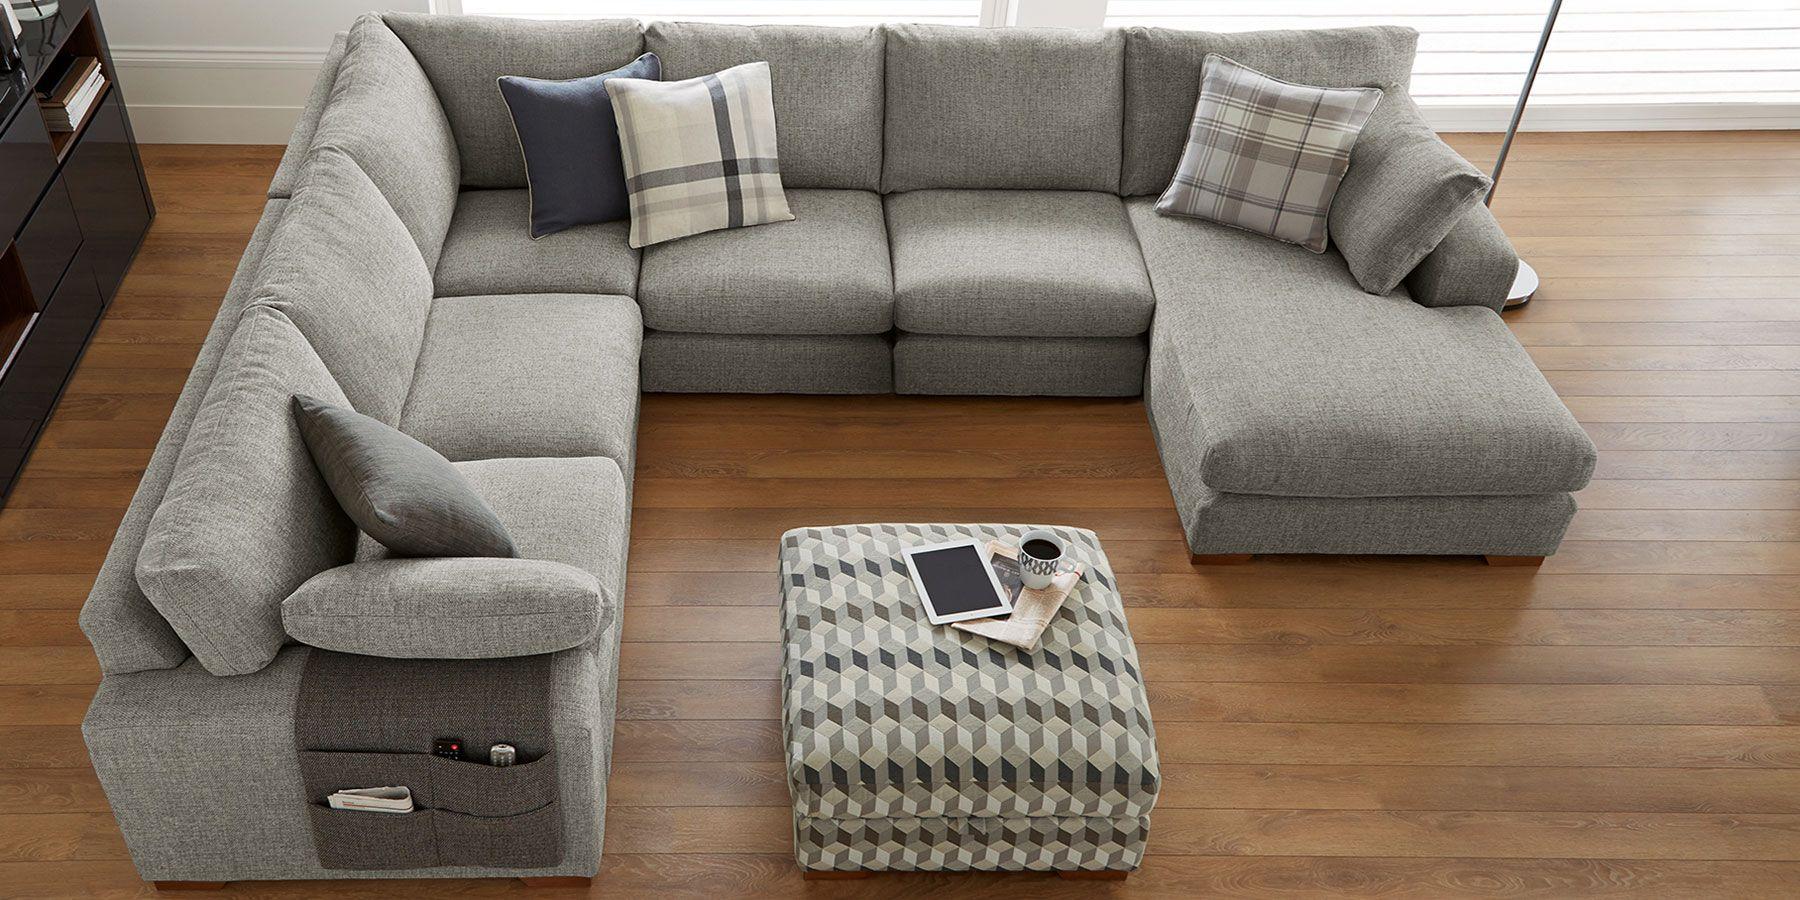 buy sonoma modular left hand double seat modular natural blend dark rh pinterest com